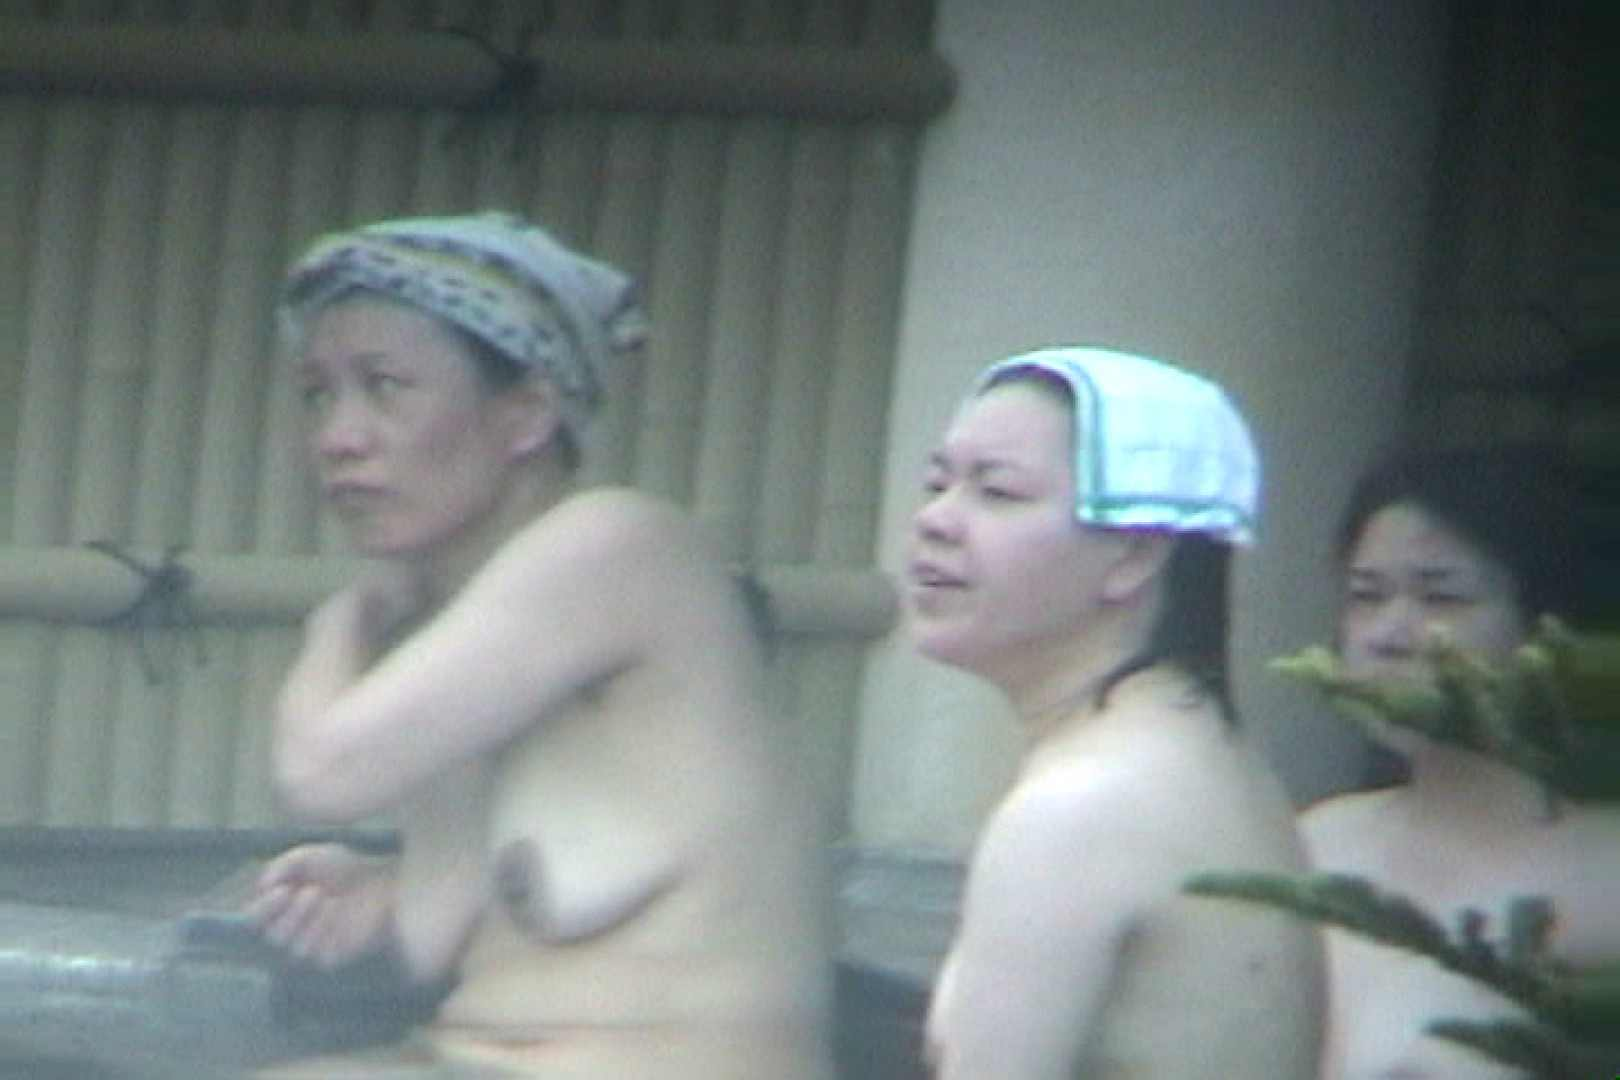 Aquaな露天風呂Vol.107 露天風呂編  111PIX 58